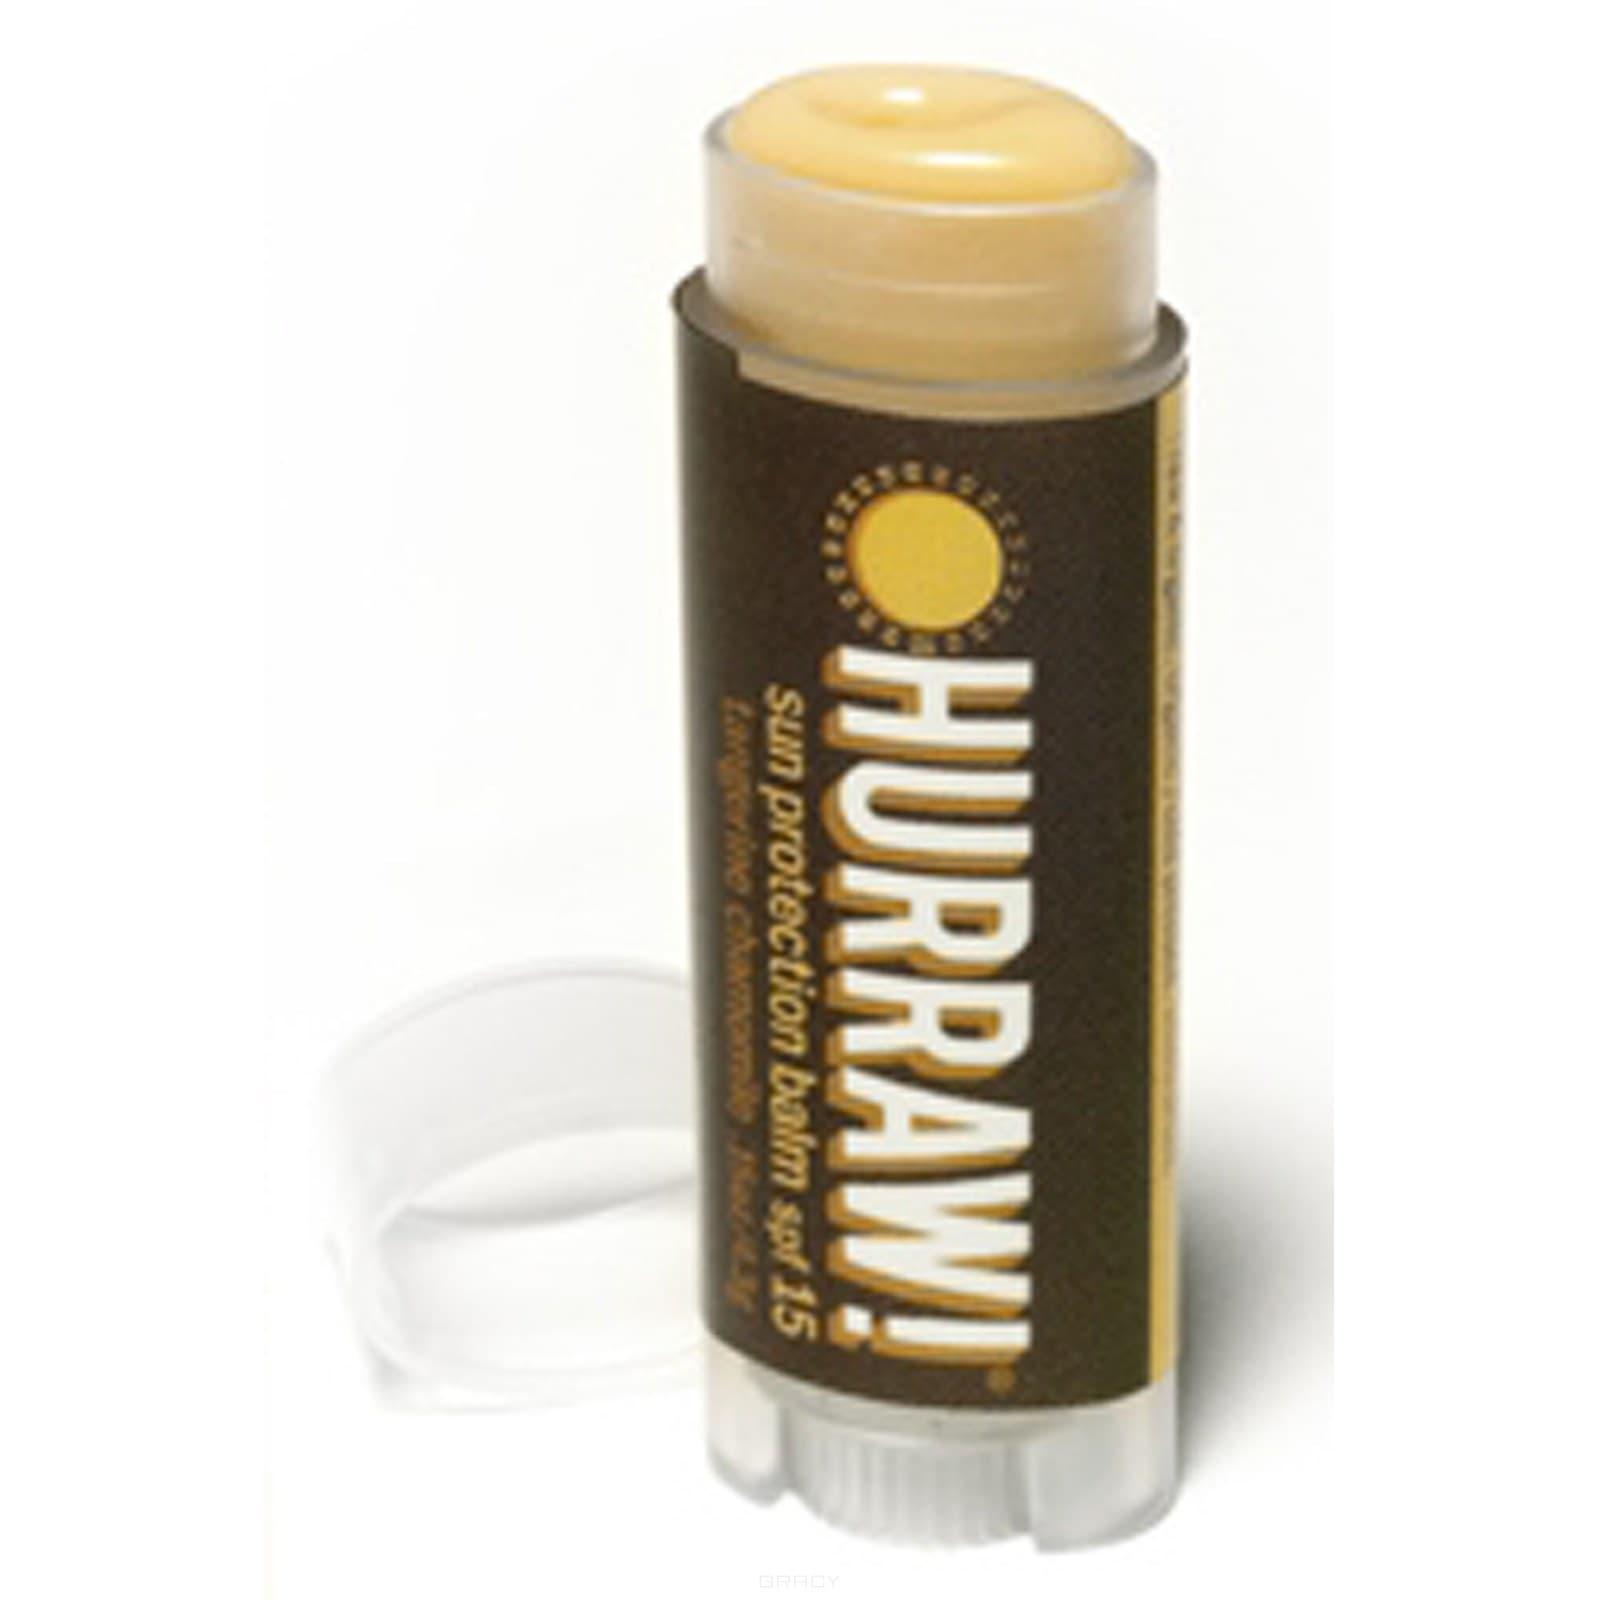 Hurraw Бальзам для губ Мандарин, ваниль, ромашка Sun Protection Balm SPF 15, Бальзам для губ Мандарин, ваниль, ромашка Sun Protection Balm SPF 15, 1 шт hurraw бальзам для губ coconut lip balm 4 3 г